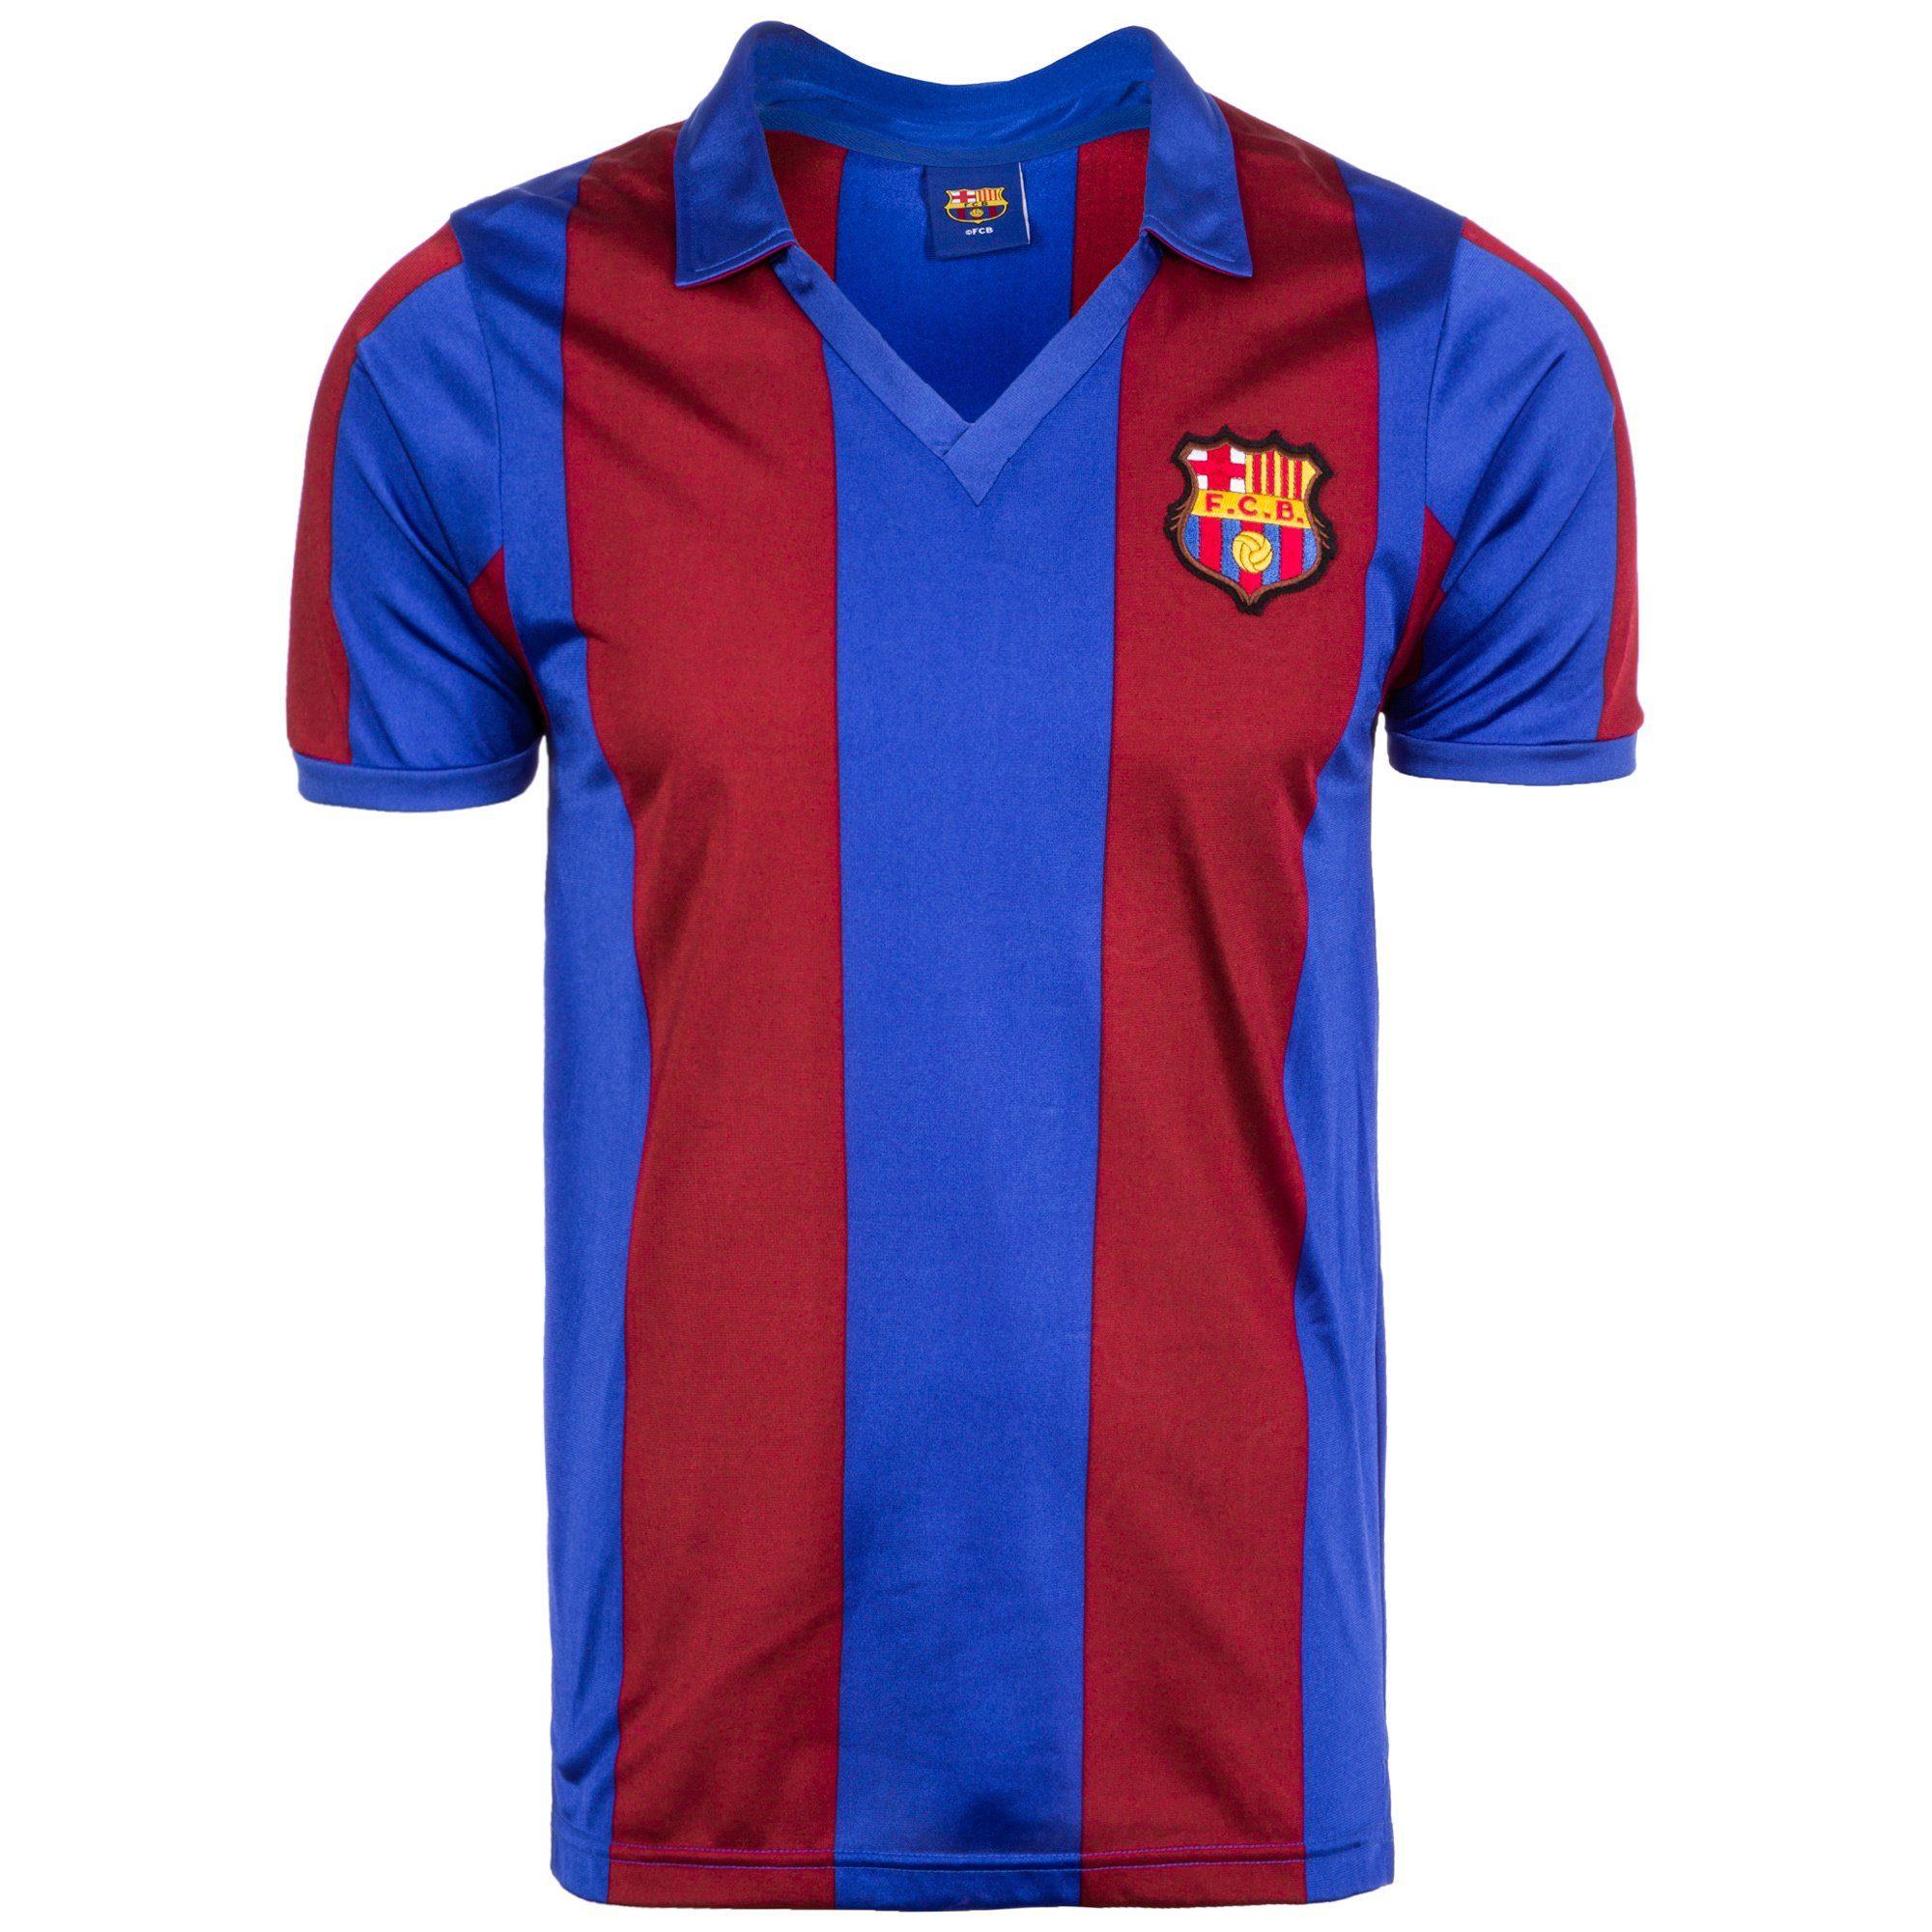 Score Draw Fußballtrikot Fc Barcelona 1982 | Sportbekleidung > Trikots | Rot | Trikot - Cup | Score Draw